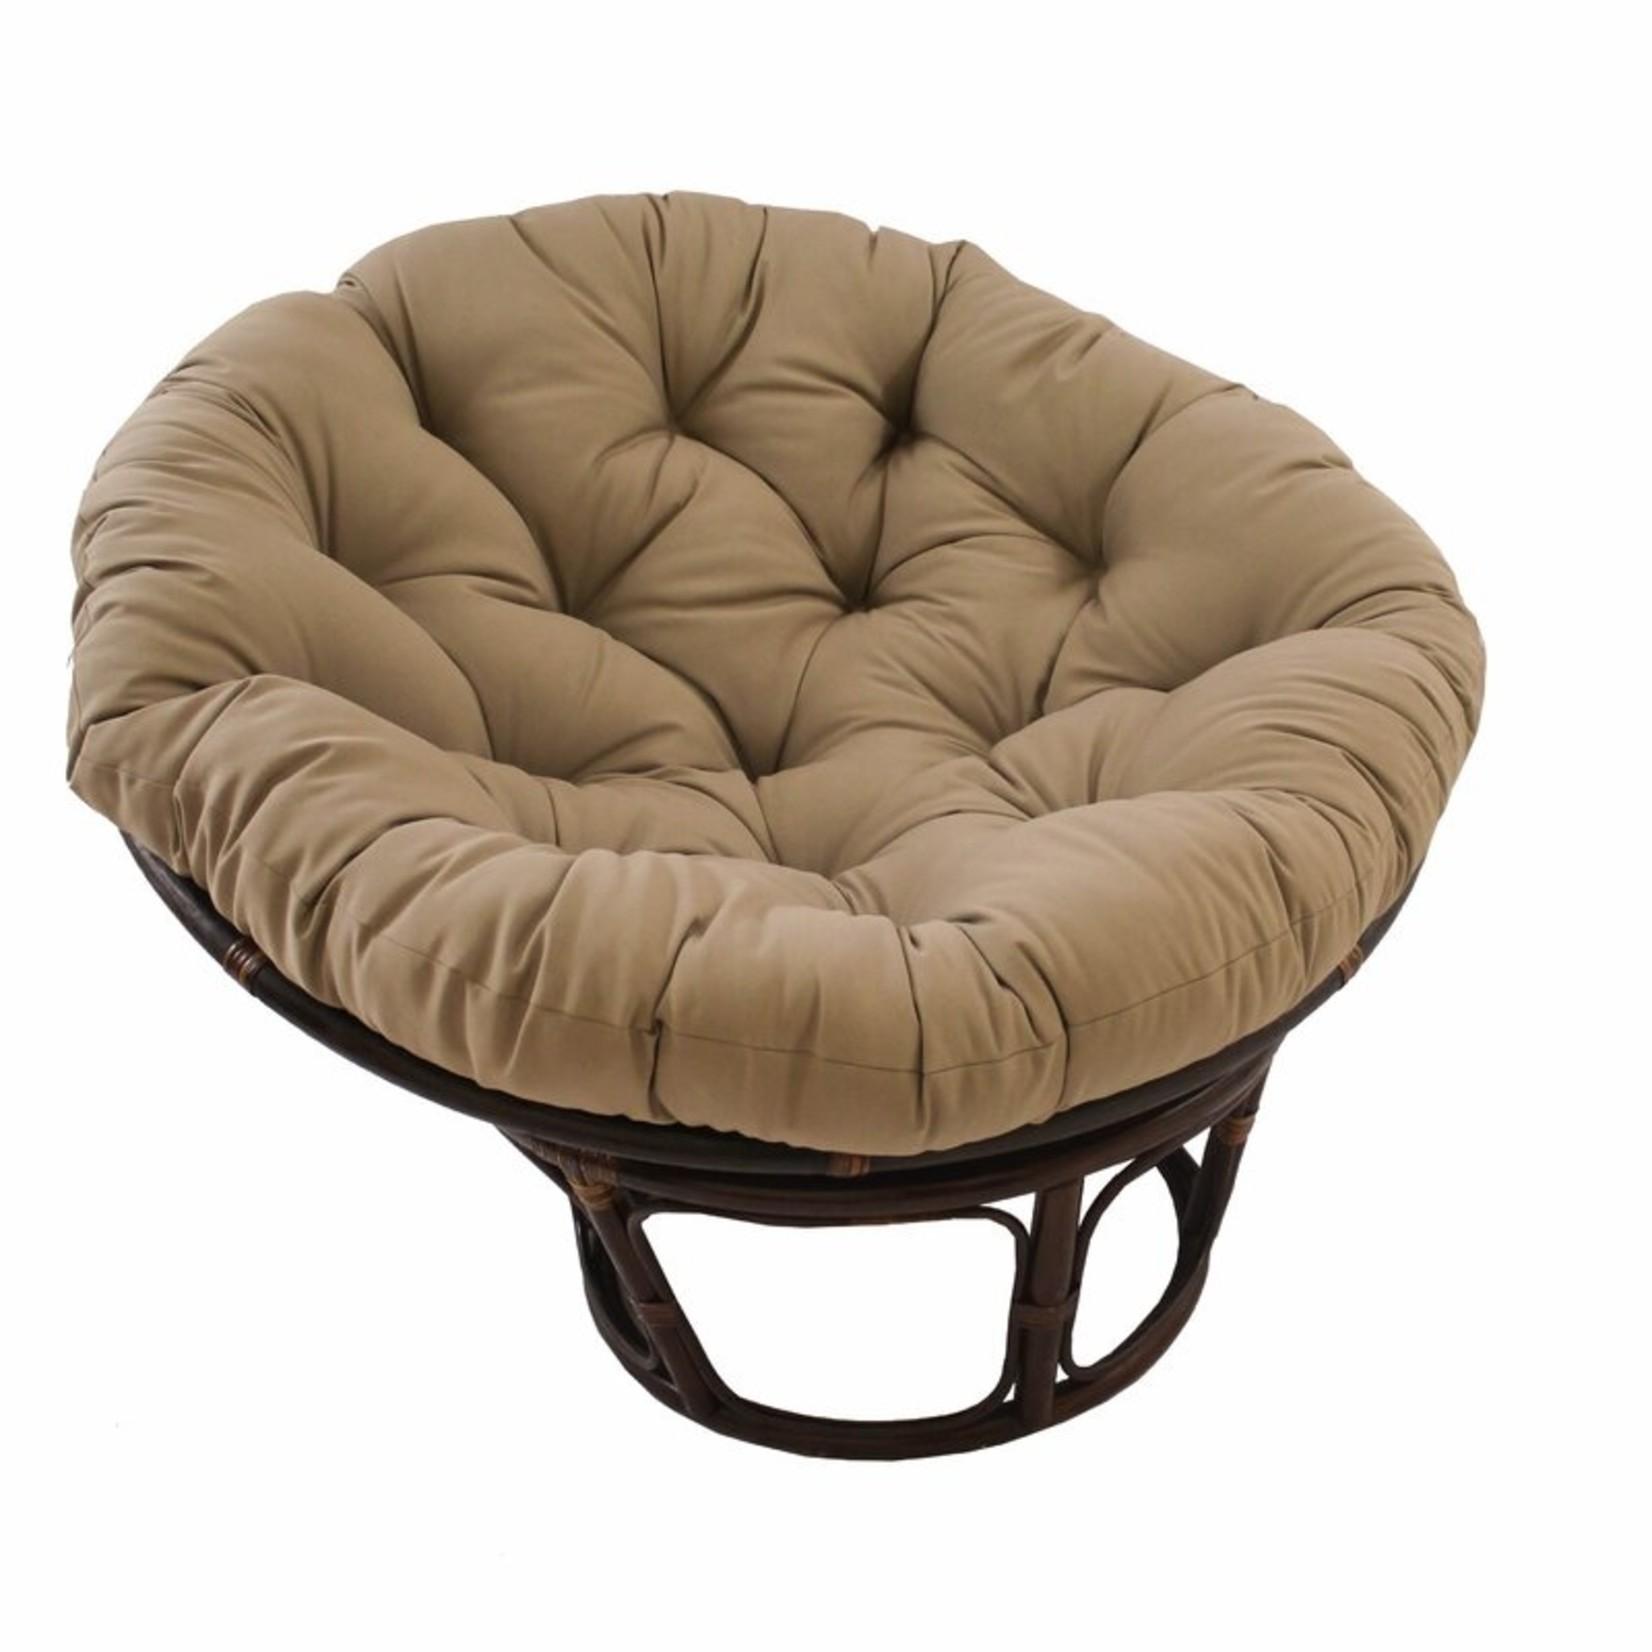 *Papasan Indoor Lounge Chair Cushion - Toffee